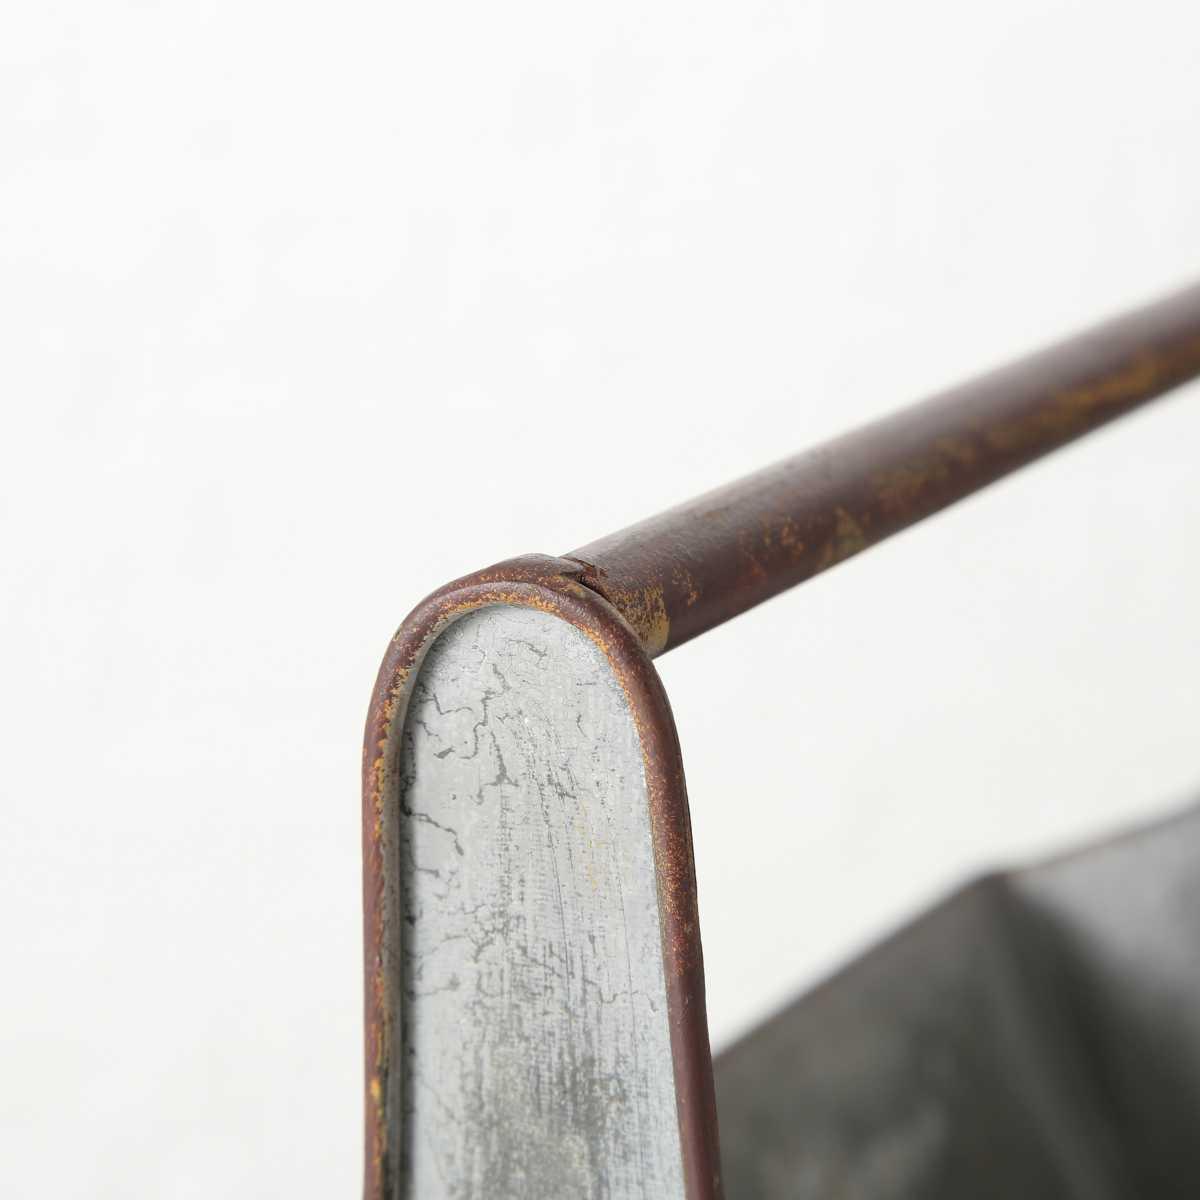 Deko Pflanztopf Carlson Metall Zink Pflanzschale Zinkwanne Zinktopf Vintage 29cm